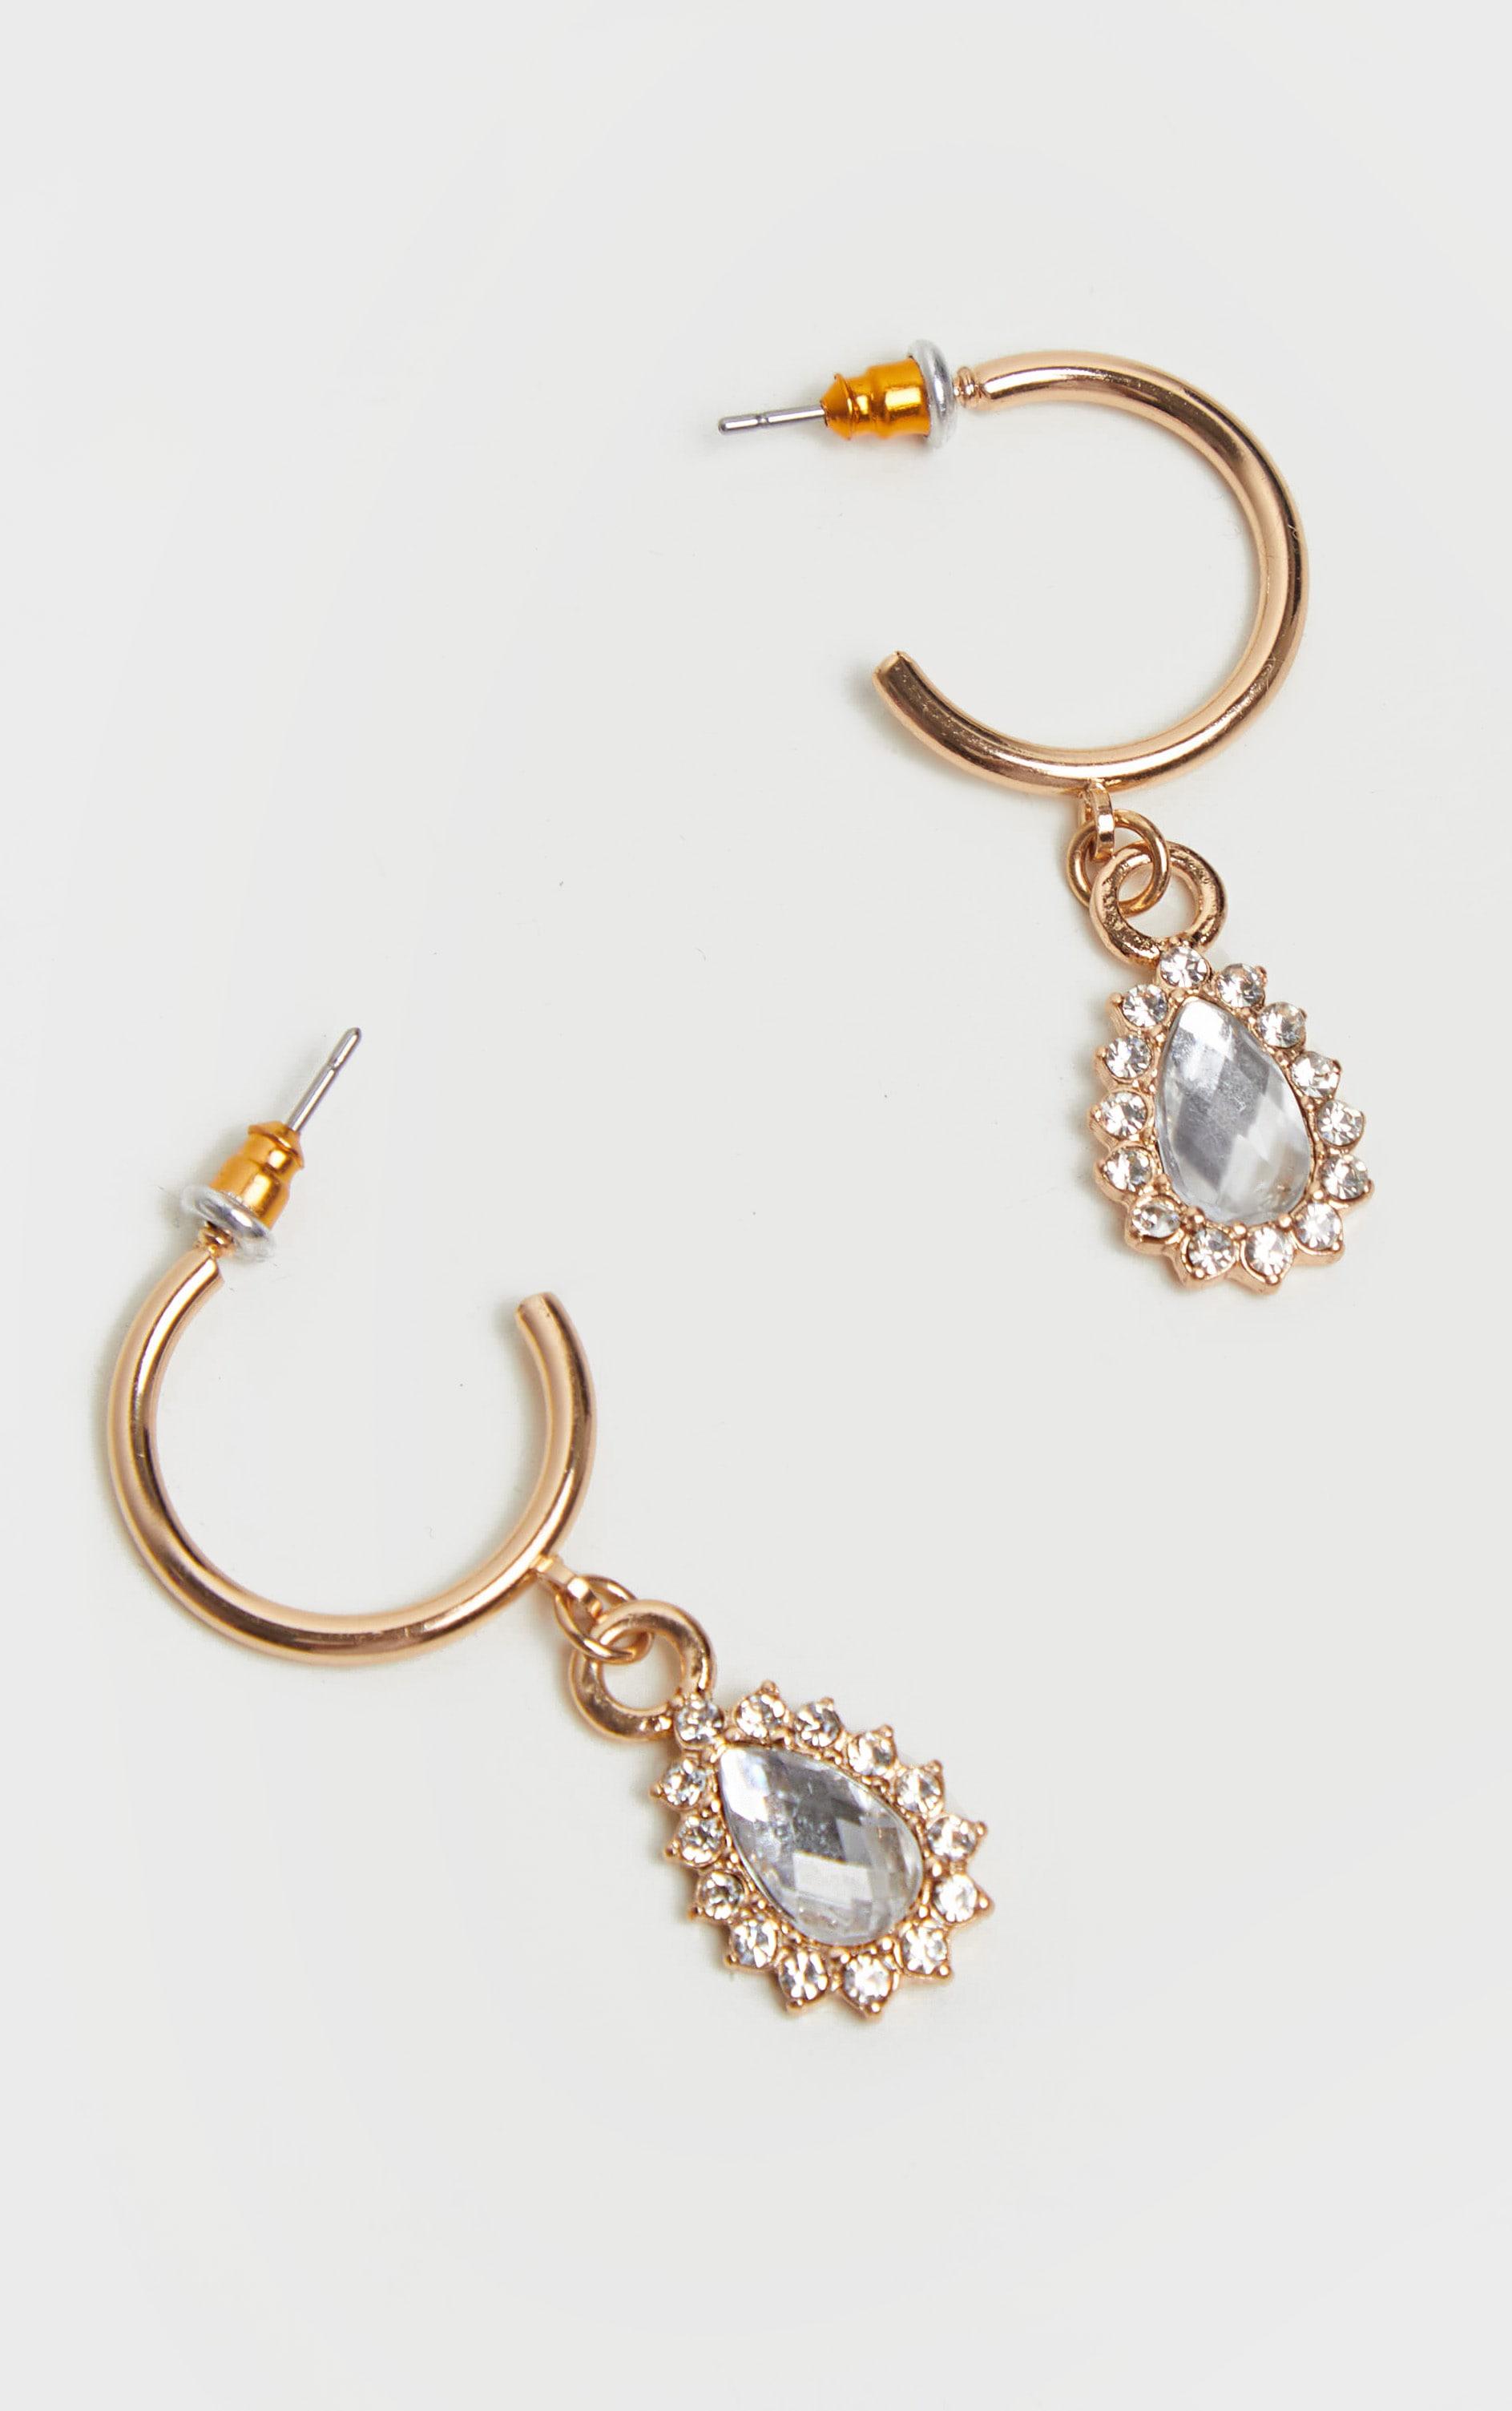 Gold Mini Hoop And Diamante Charm Earrings 2